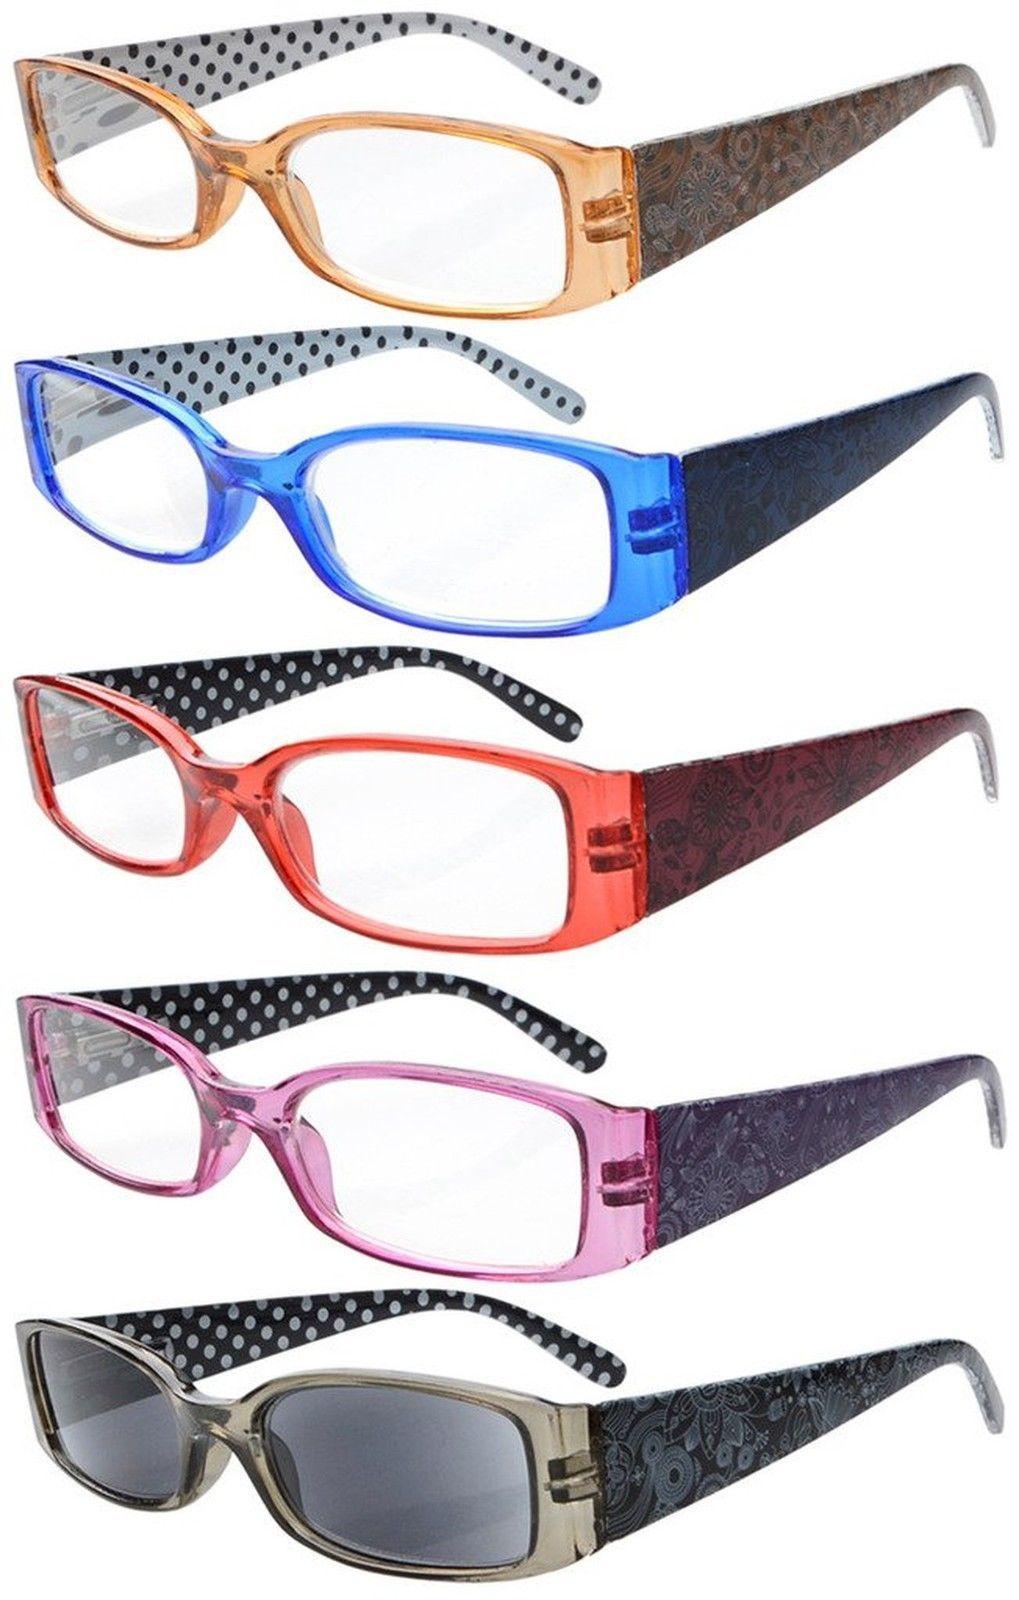 0ec305a0fa7c MEGA DESIGNER 5-PACK 1.50 Fashion Folding Mens Womens Unisex READING GLASSES  | eBay #